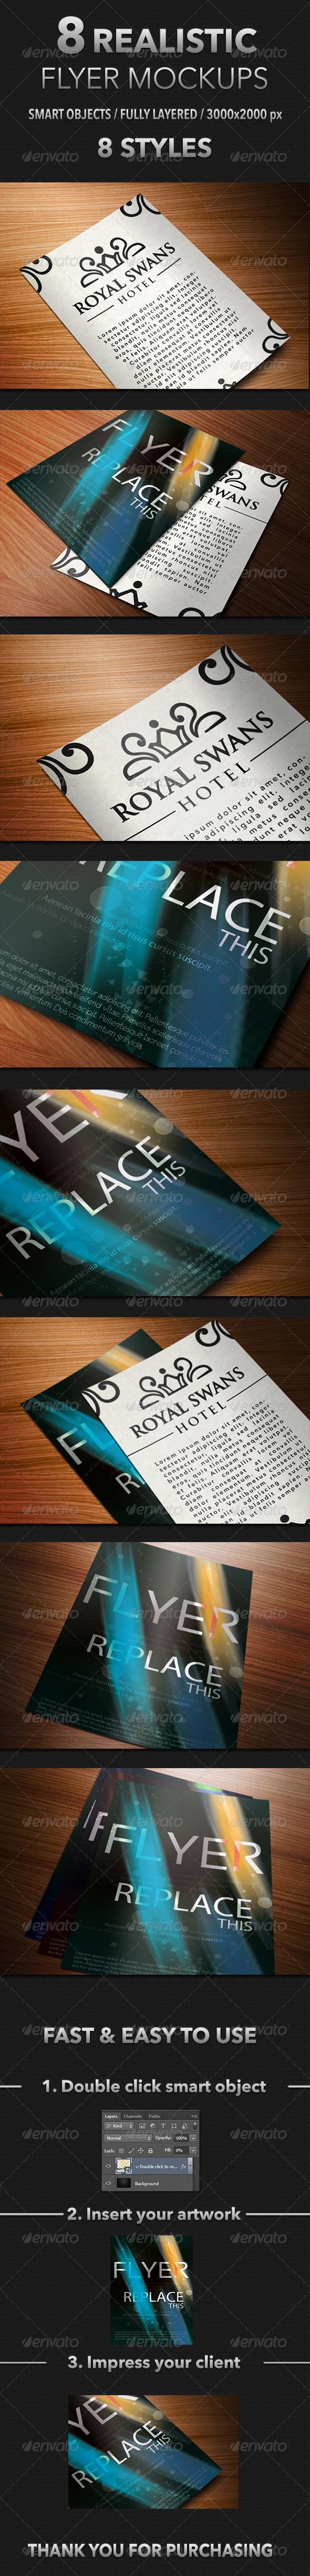 8 Realistic Flyer Mockups - Flyers Print